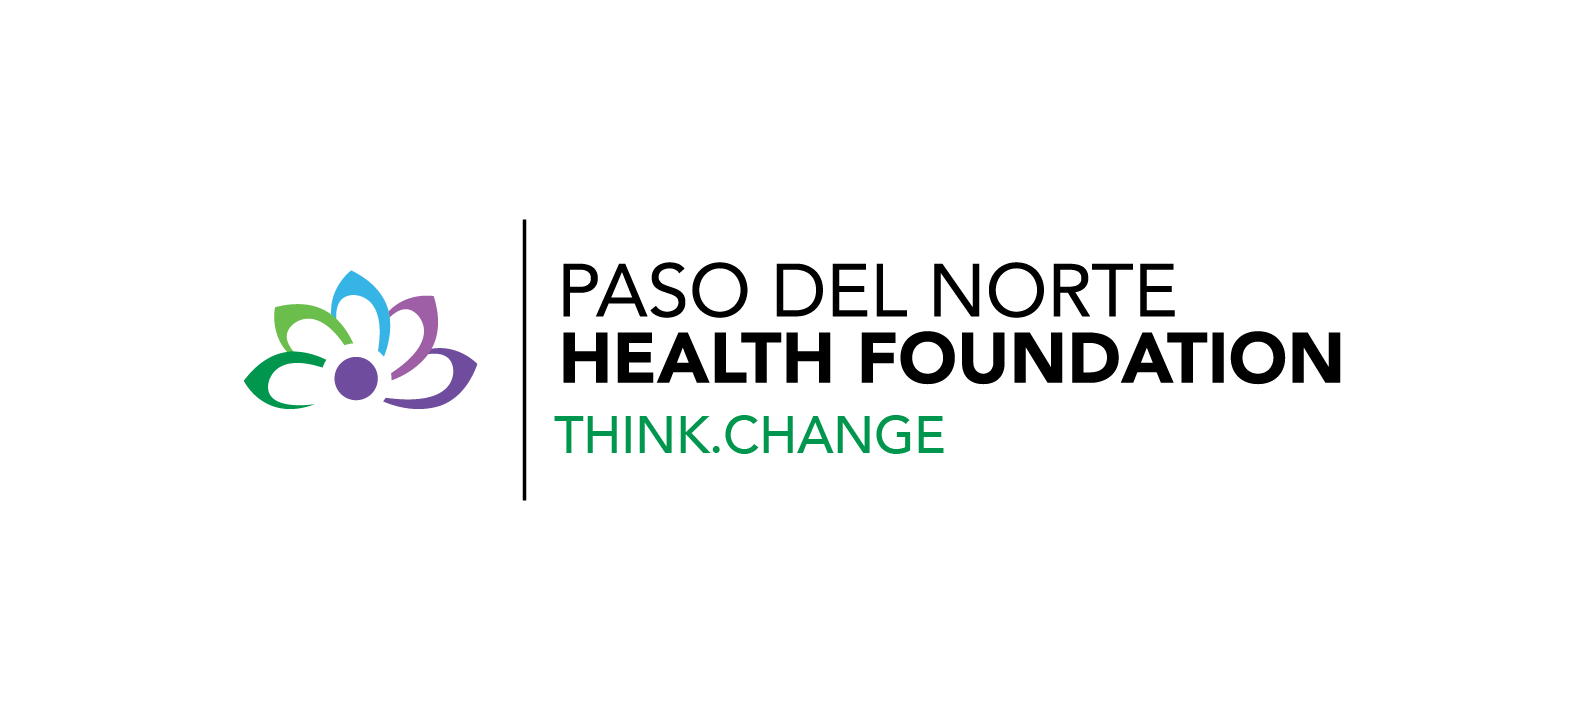 Paso Del Norte Health Foundation Think.Change logo